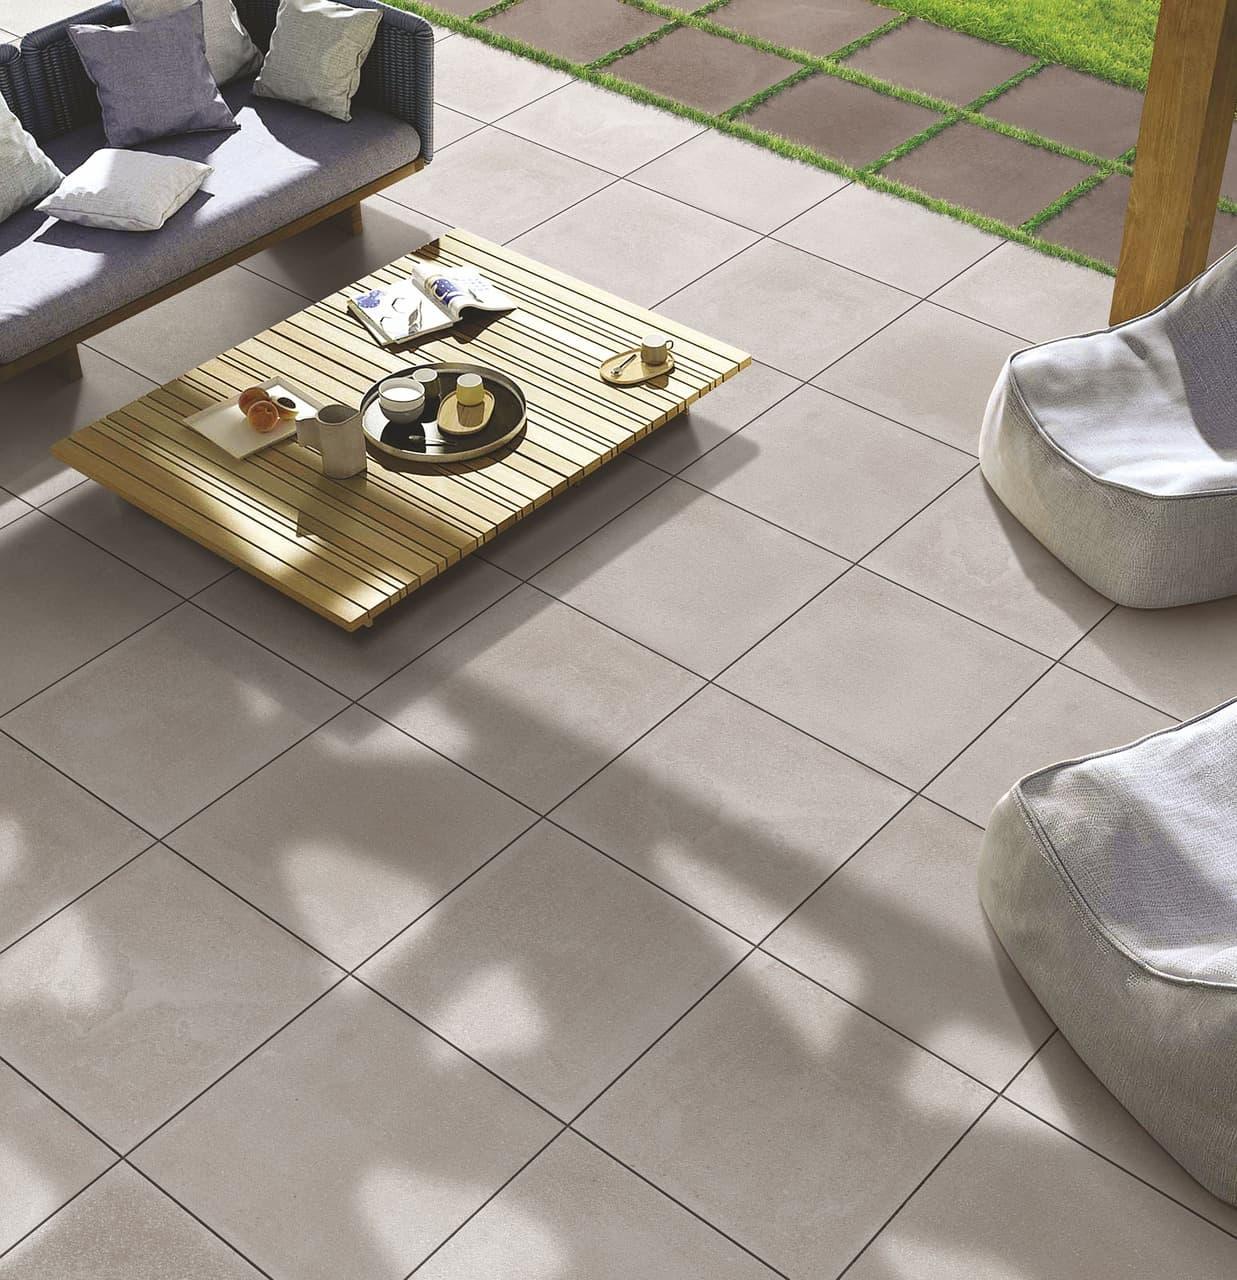 Mapei ceramic tile mortar images tile flooring design ideas mapei floor tile adhesive images tile flooring design ideas mapei ceramic tile mortar images tile flooring dailygadgetfo Choice Image